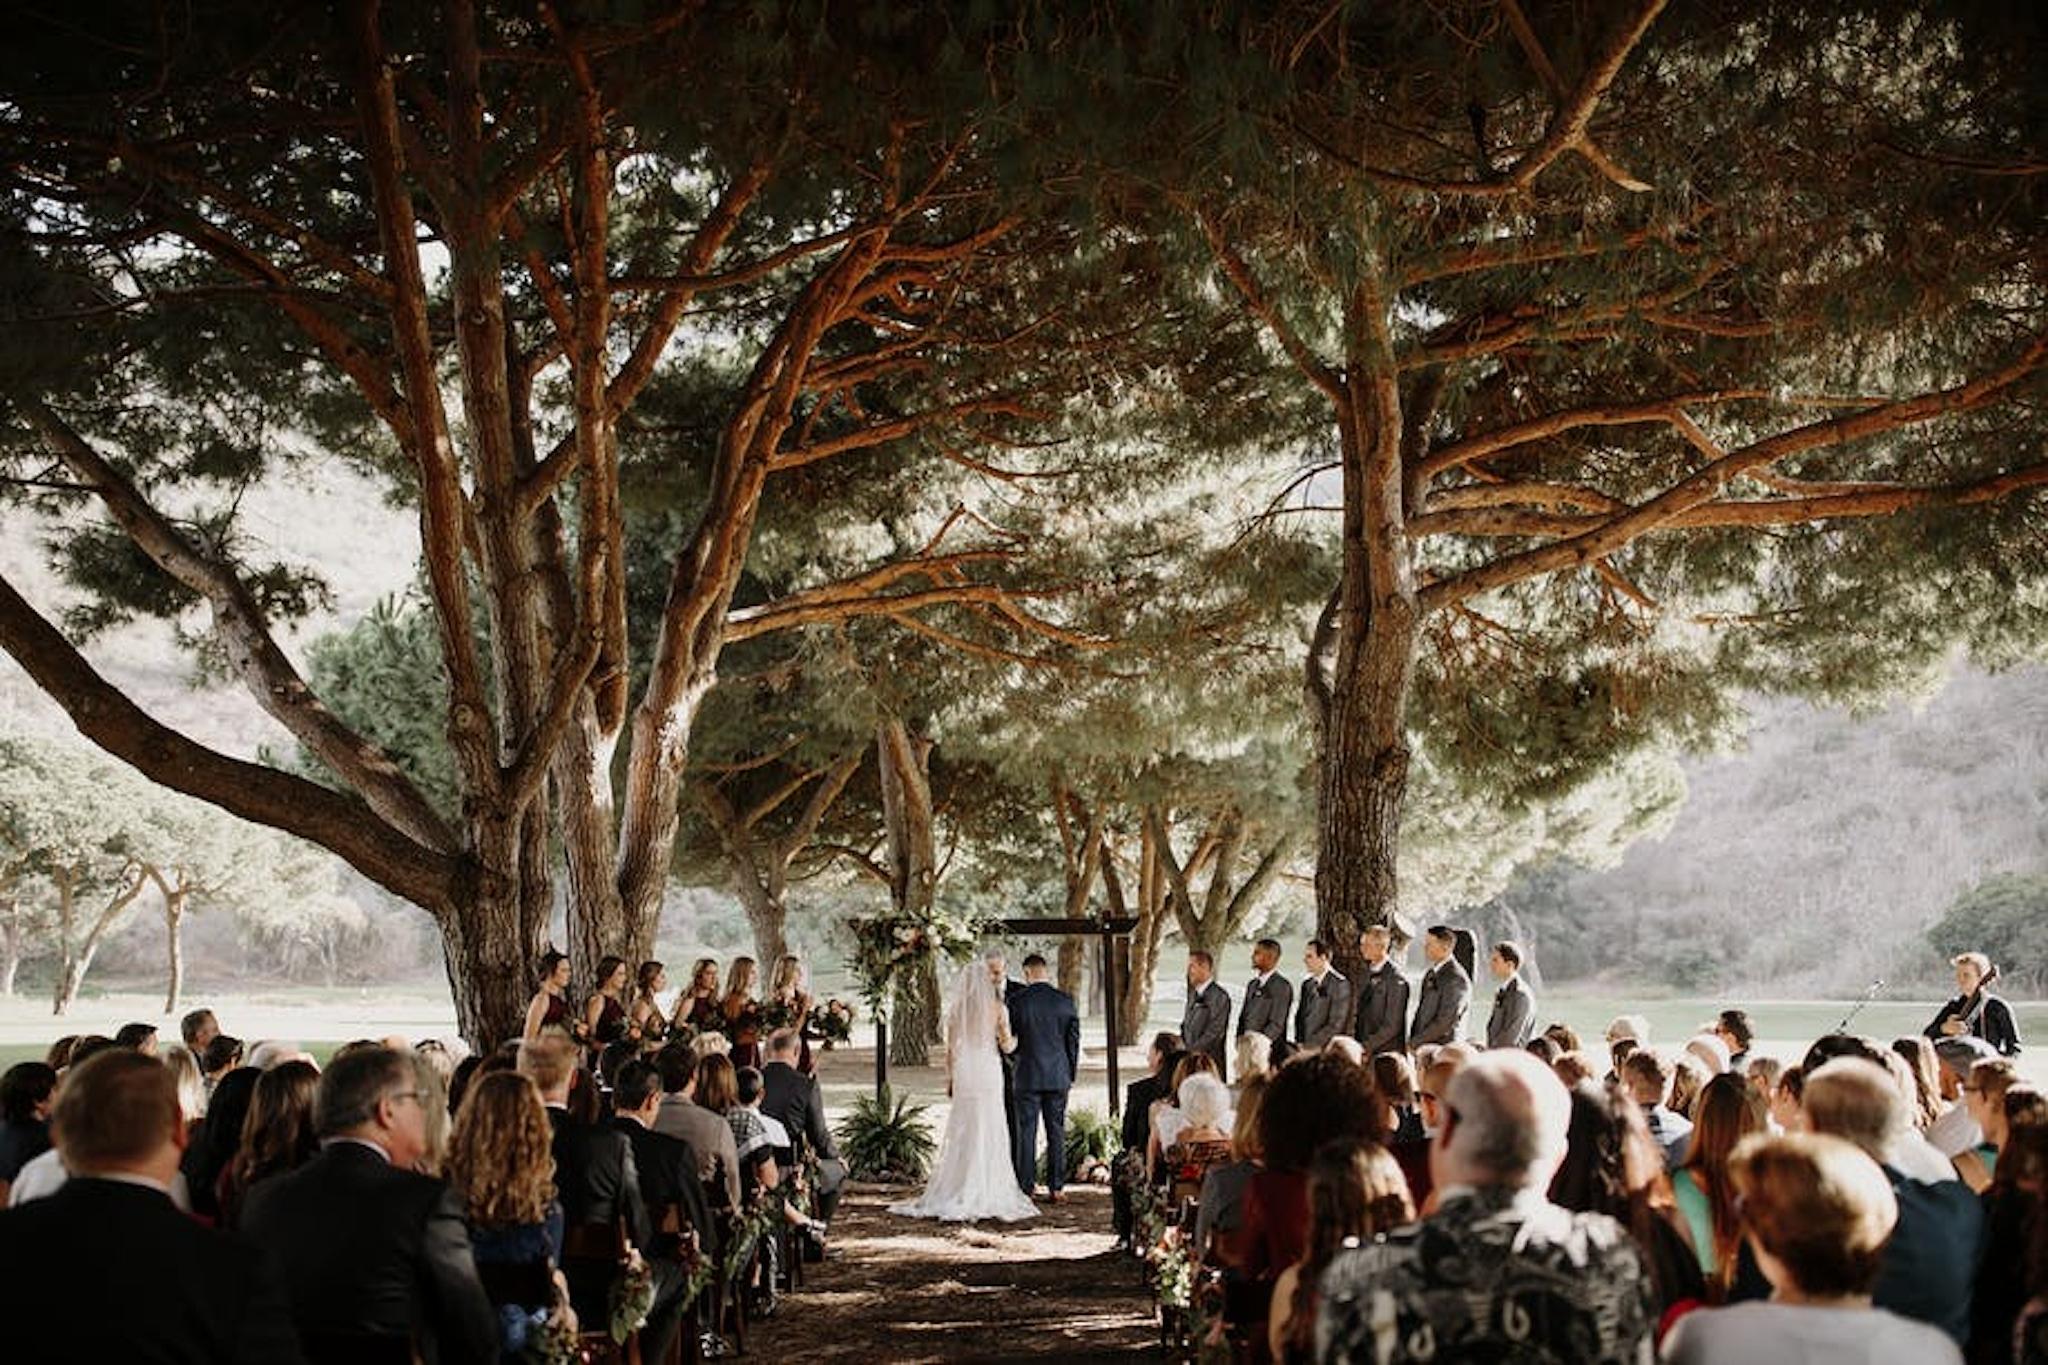 Outdoor wedding venue at The Ranch At Laguna Beach